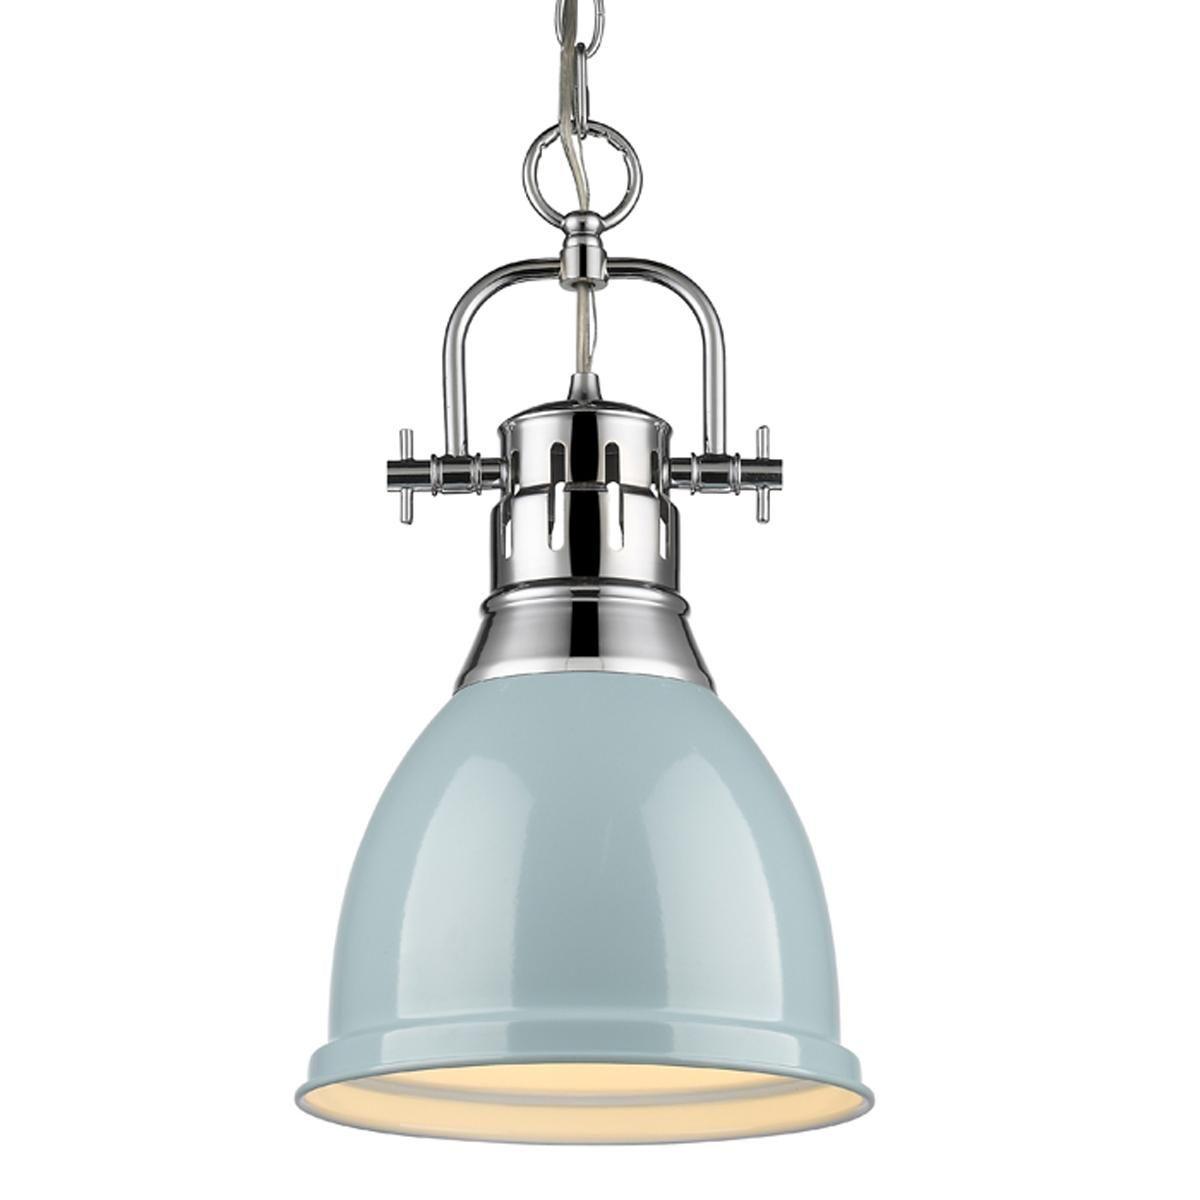 Classic Dome Shade Pendant Light | Pendant lighting, Pendants and Lights